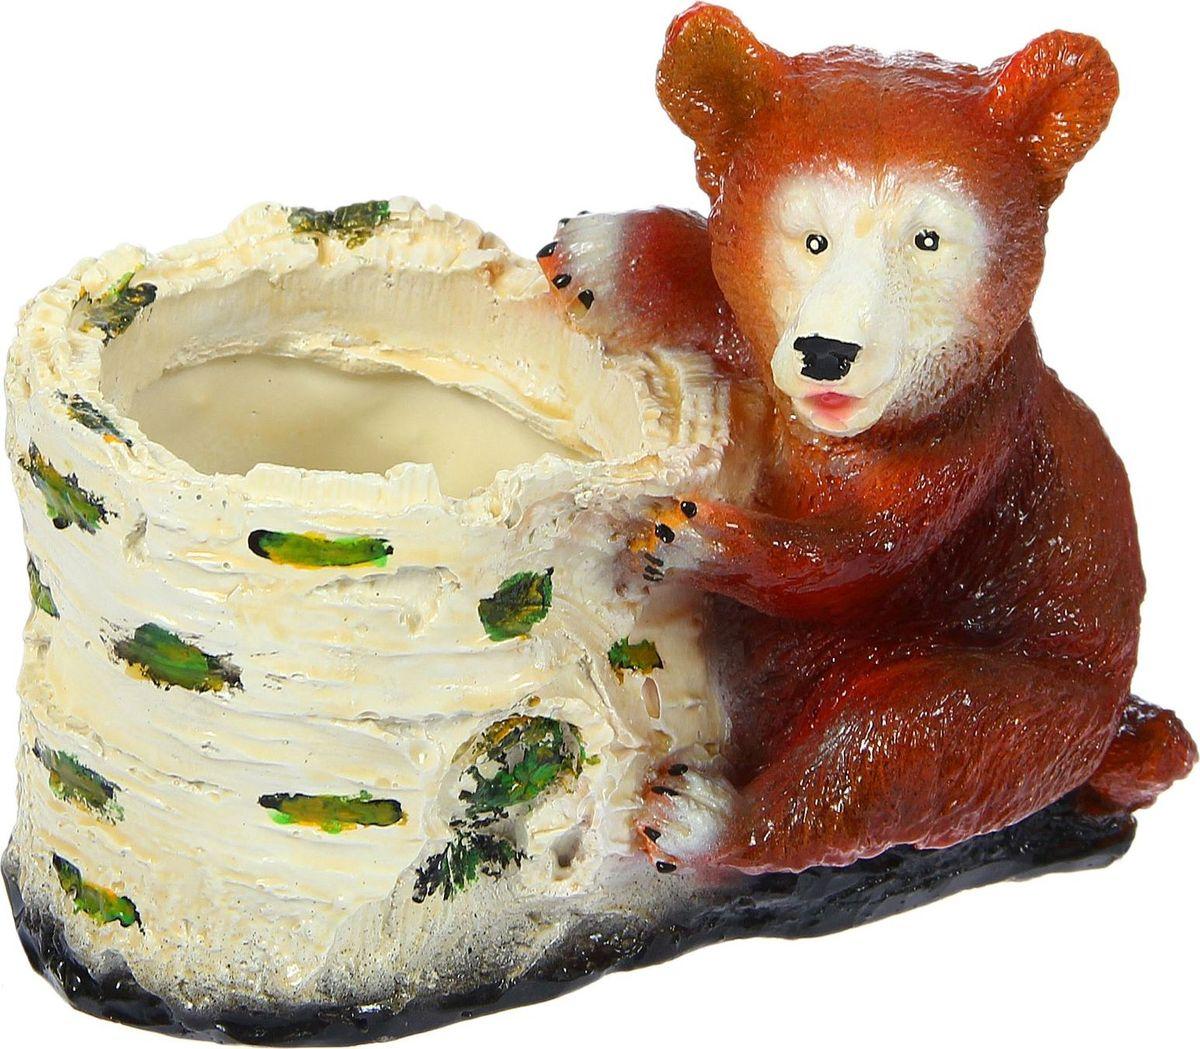 Кашпо Медведь, 14 х 20 х 18 см1422627